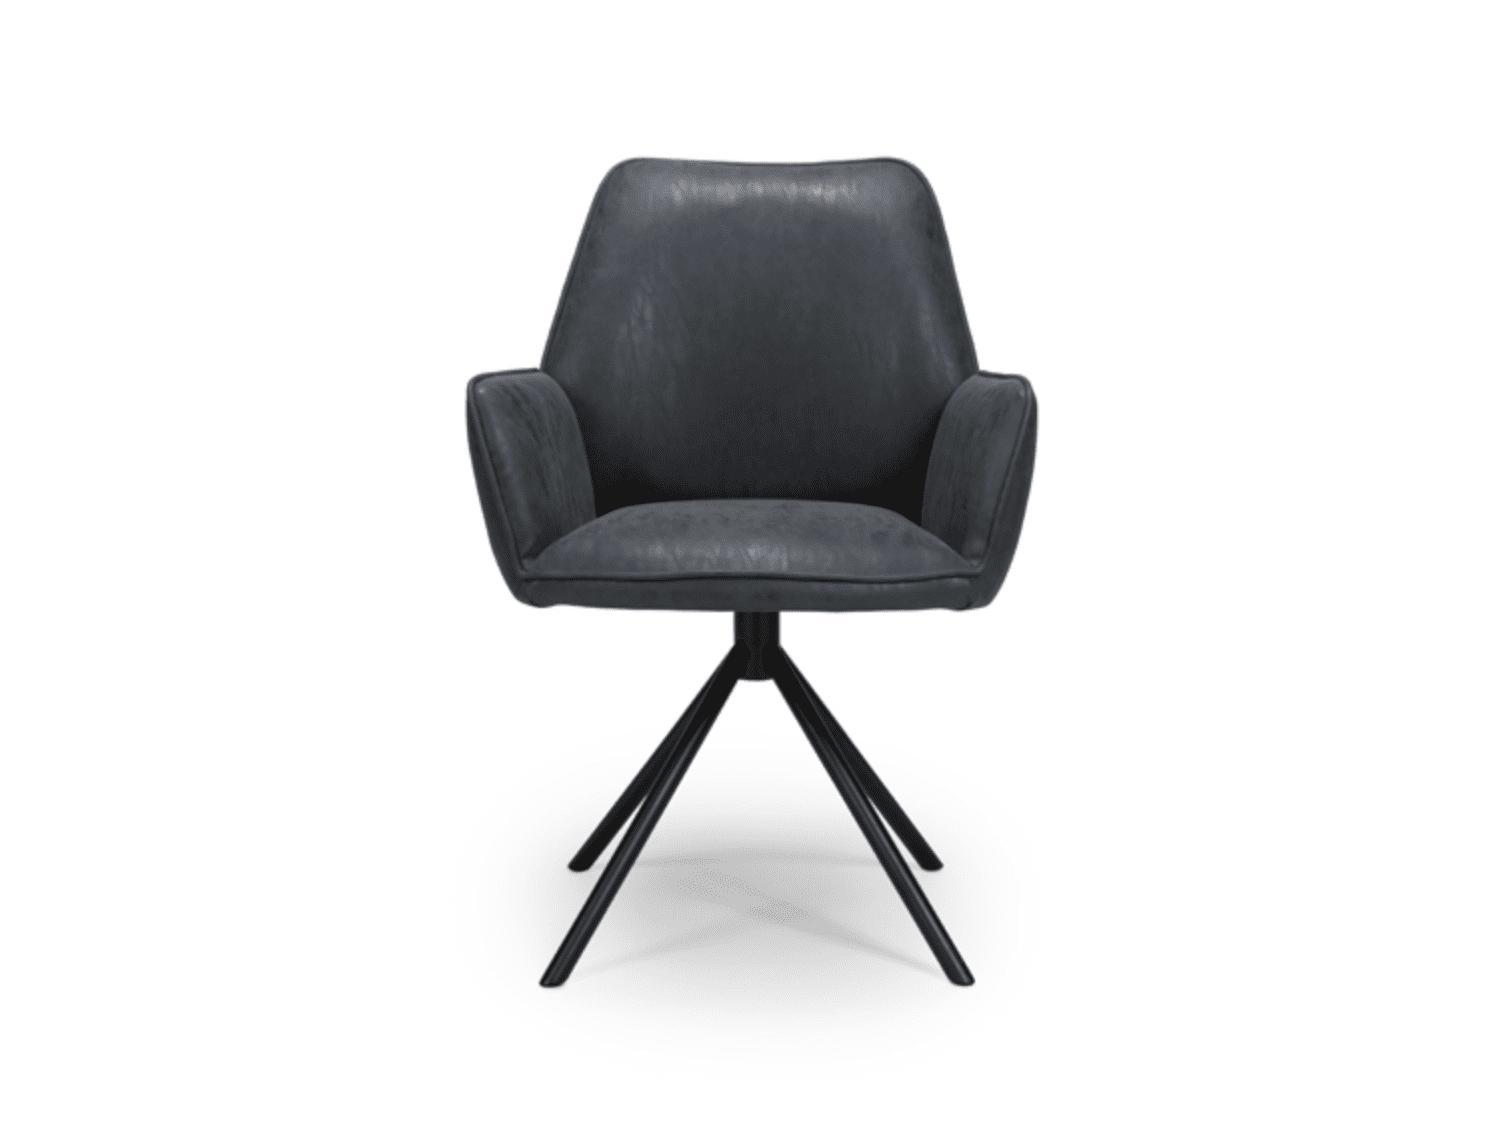 UNO chair wax grey